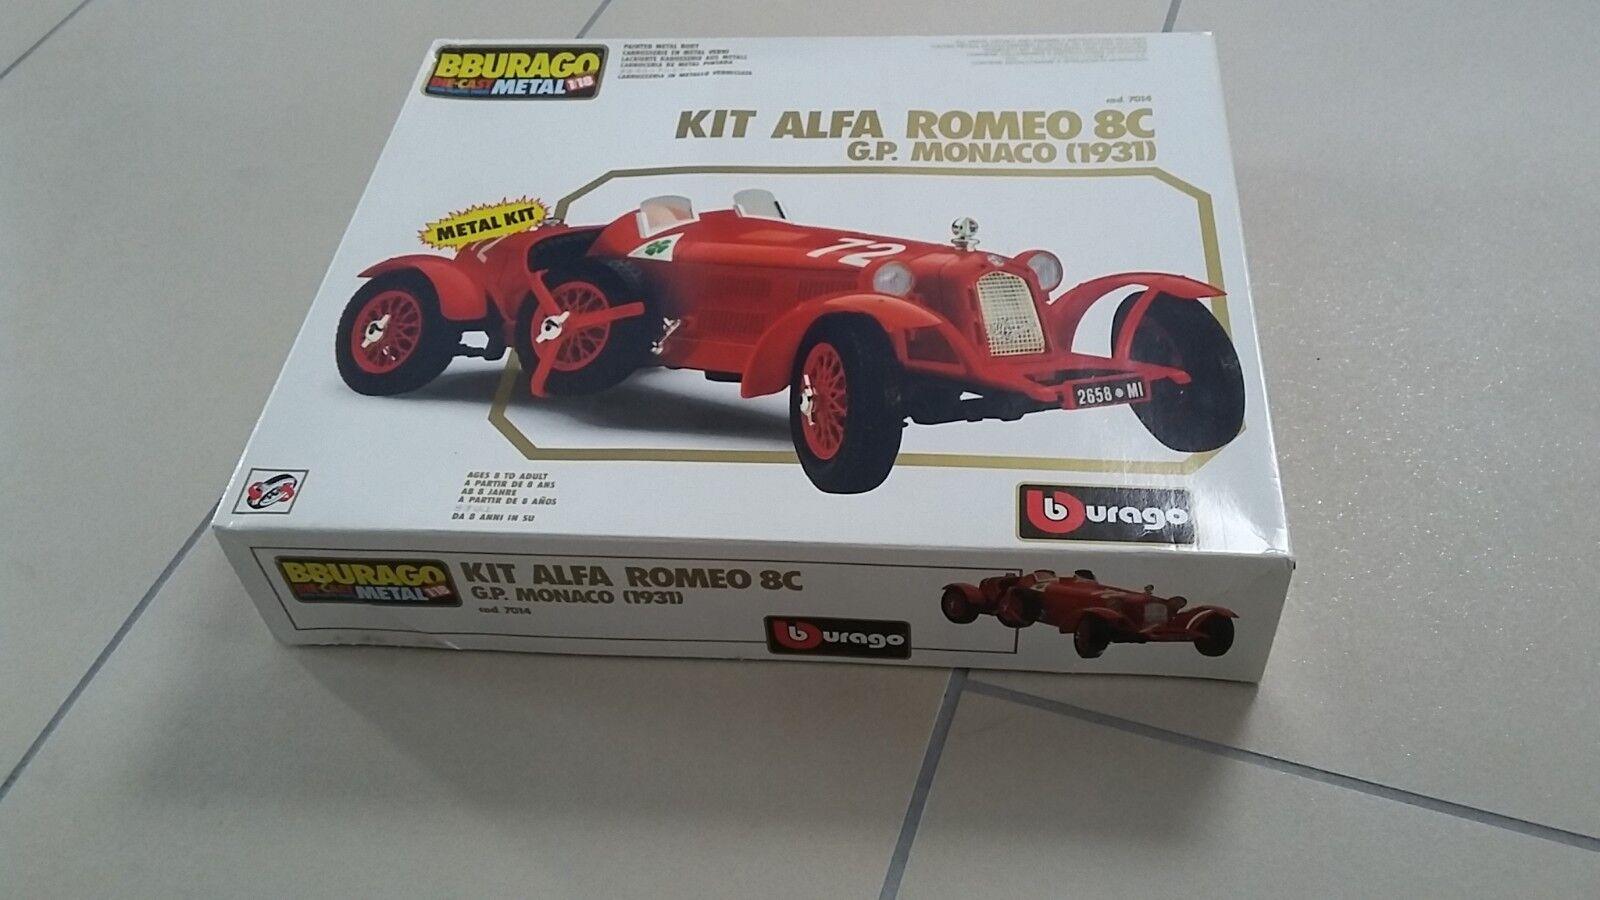 Bburago metal kit 1 18 Alfa Alfa Alfa Romeo 8c GP Monaco (1931) - neuwertig f42bbc